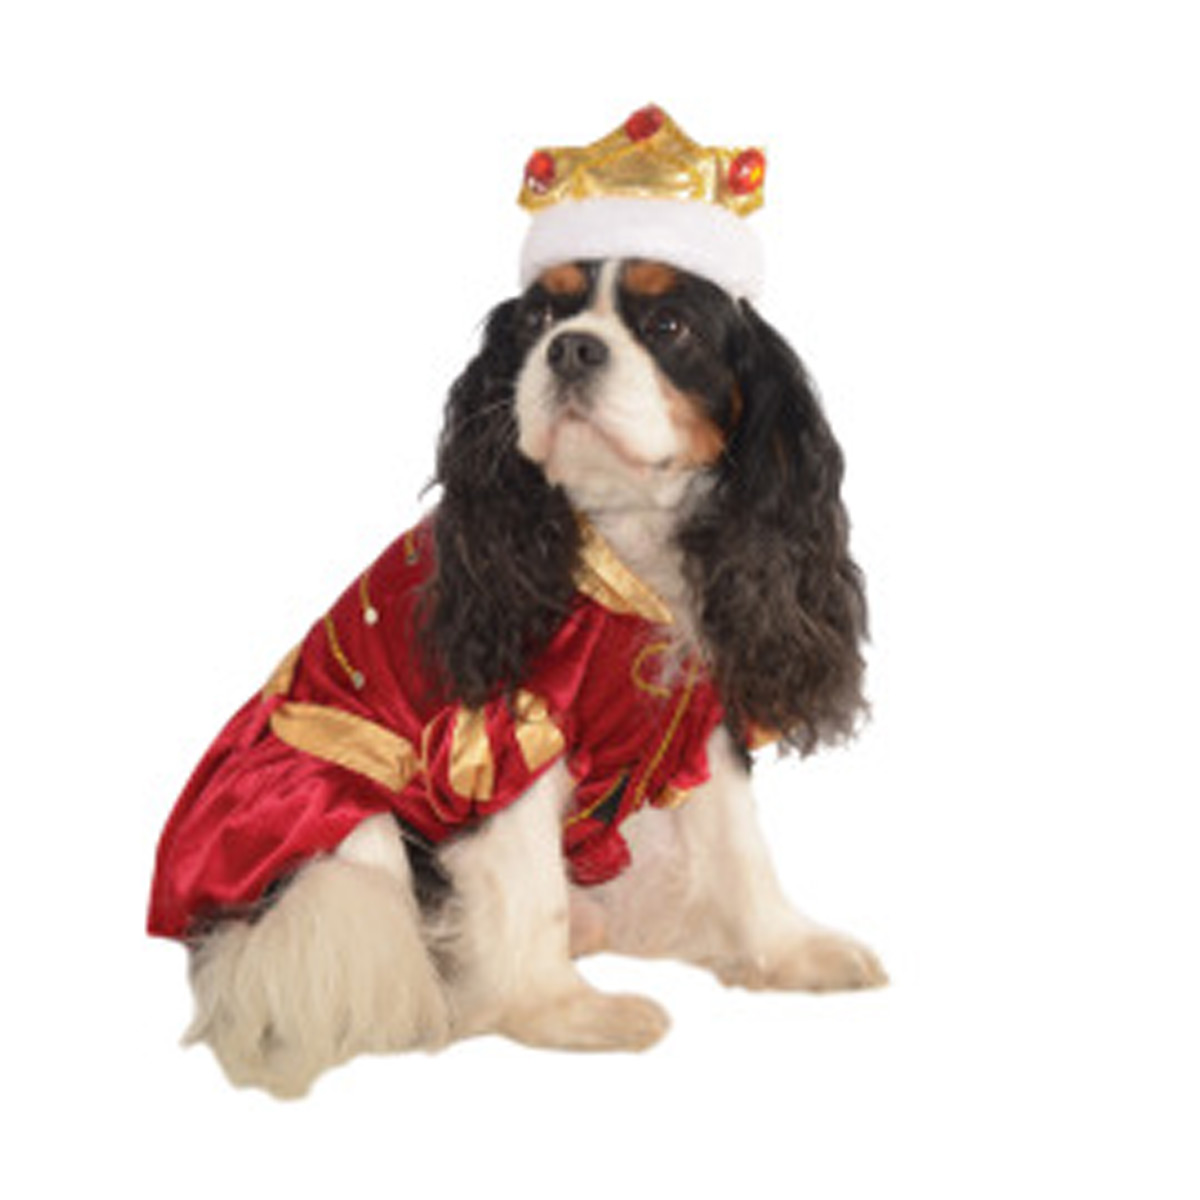 Kanine King Halloween Dog Costume